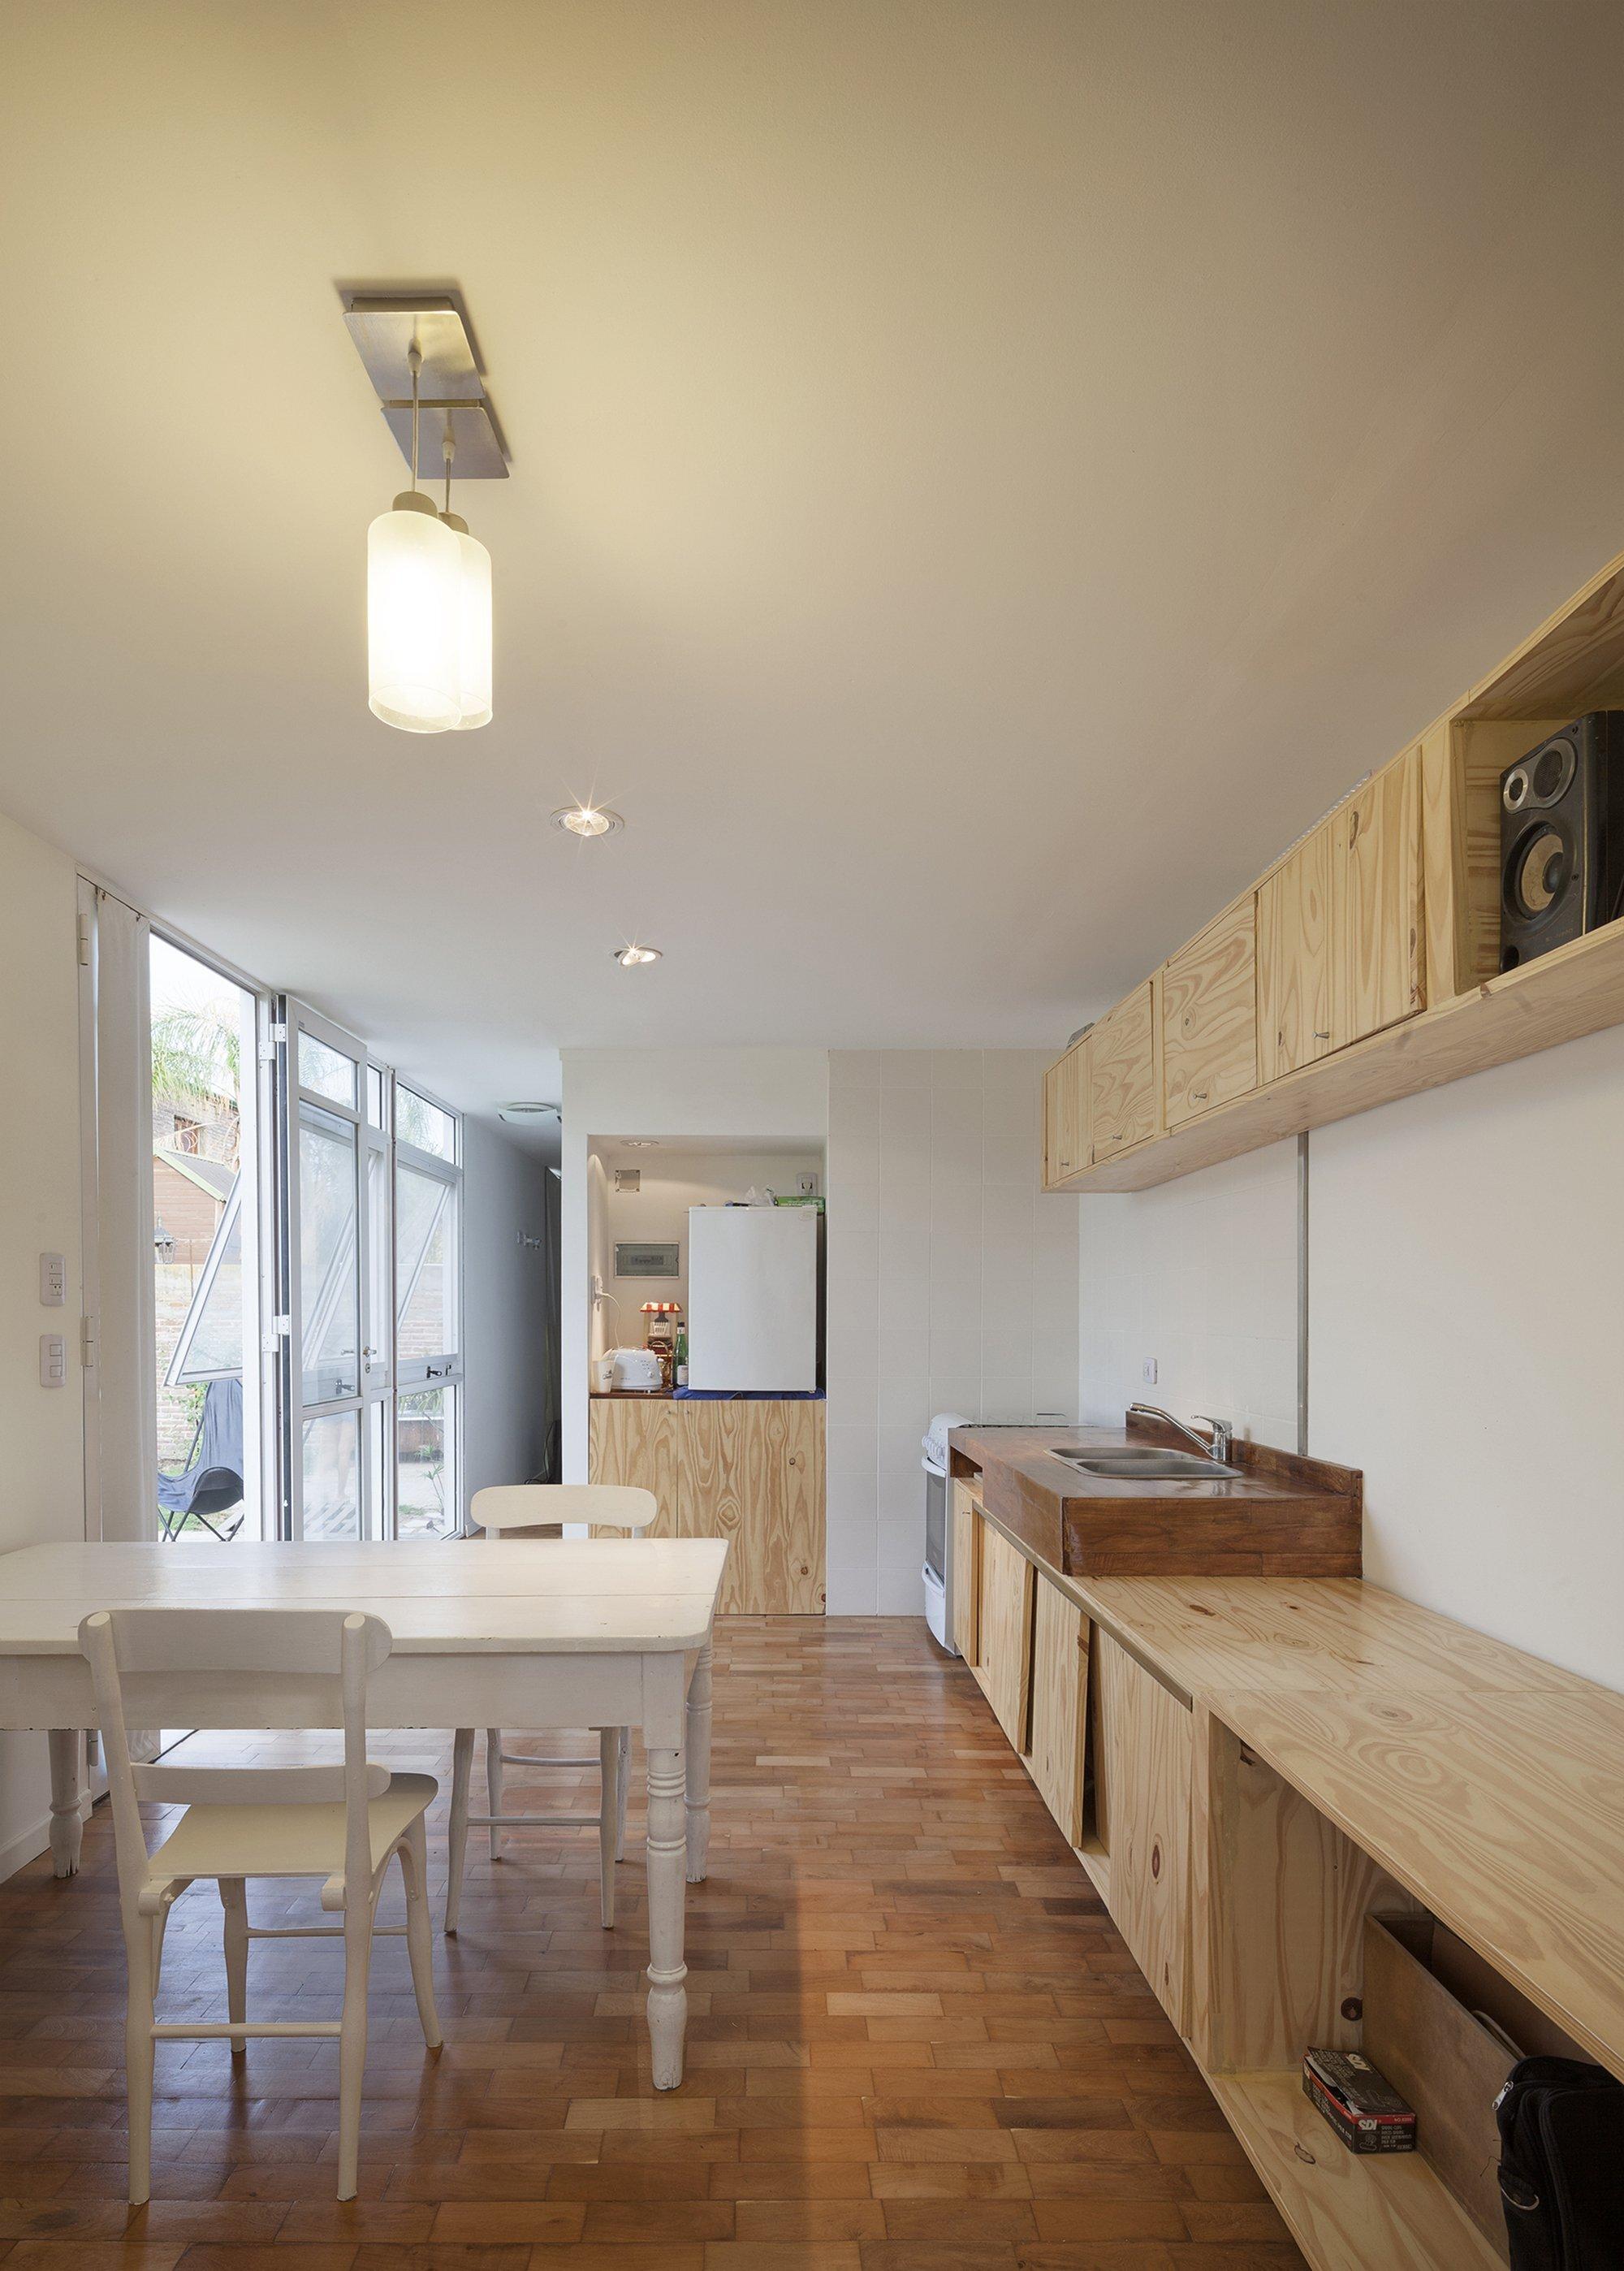 Mía House - Matias Pons Estel - Argentina - Small House - Interior Kitchen - Humble Homes